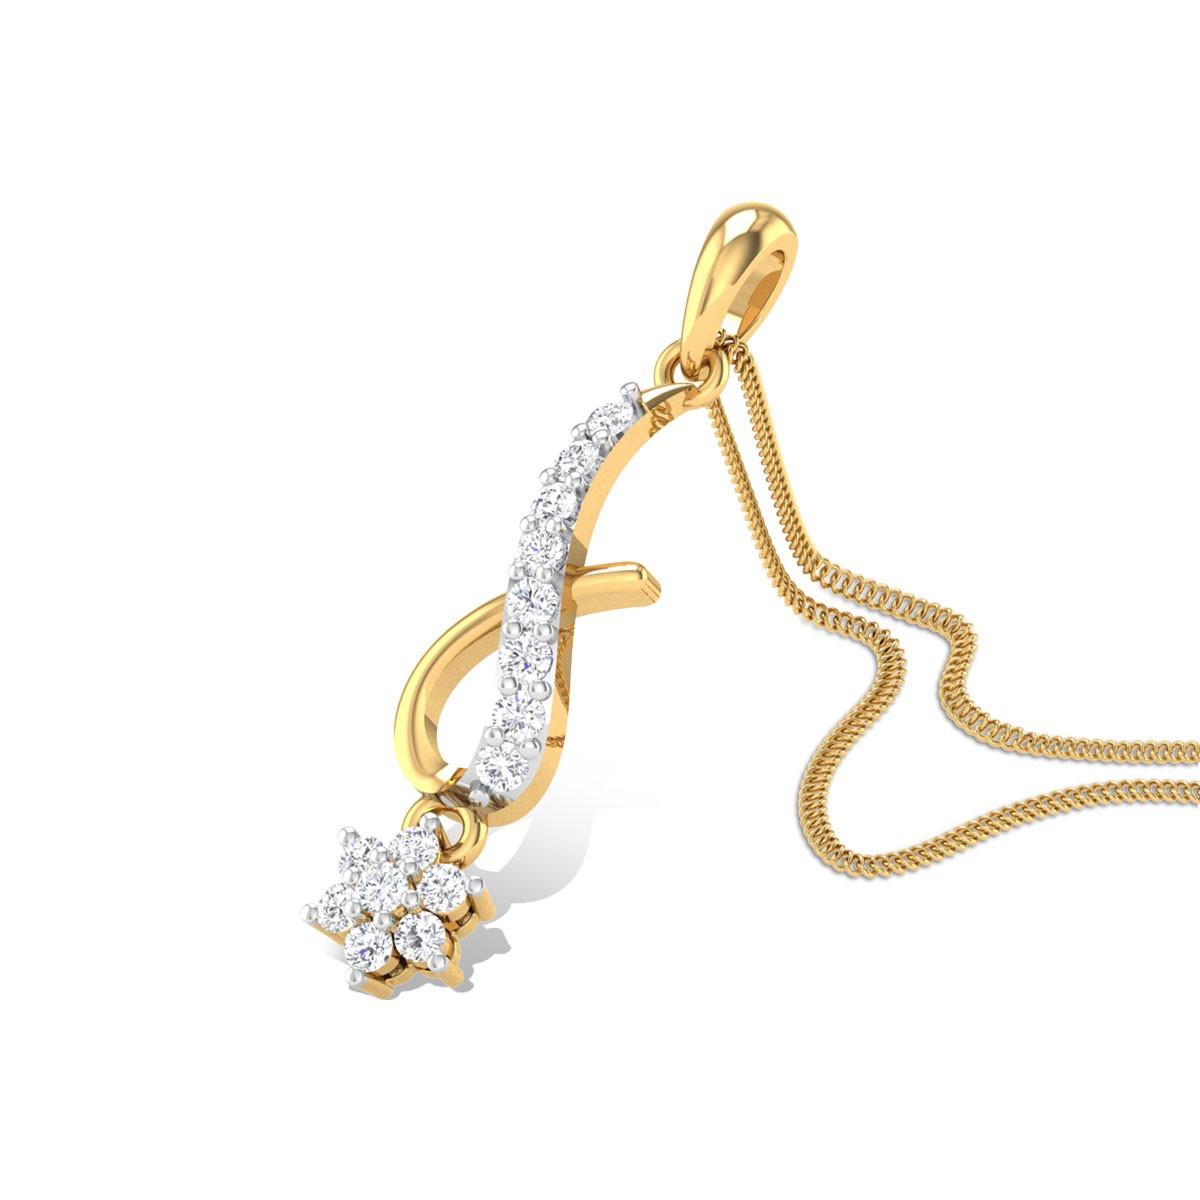 Merriment Diamond Pendant